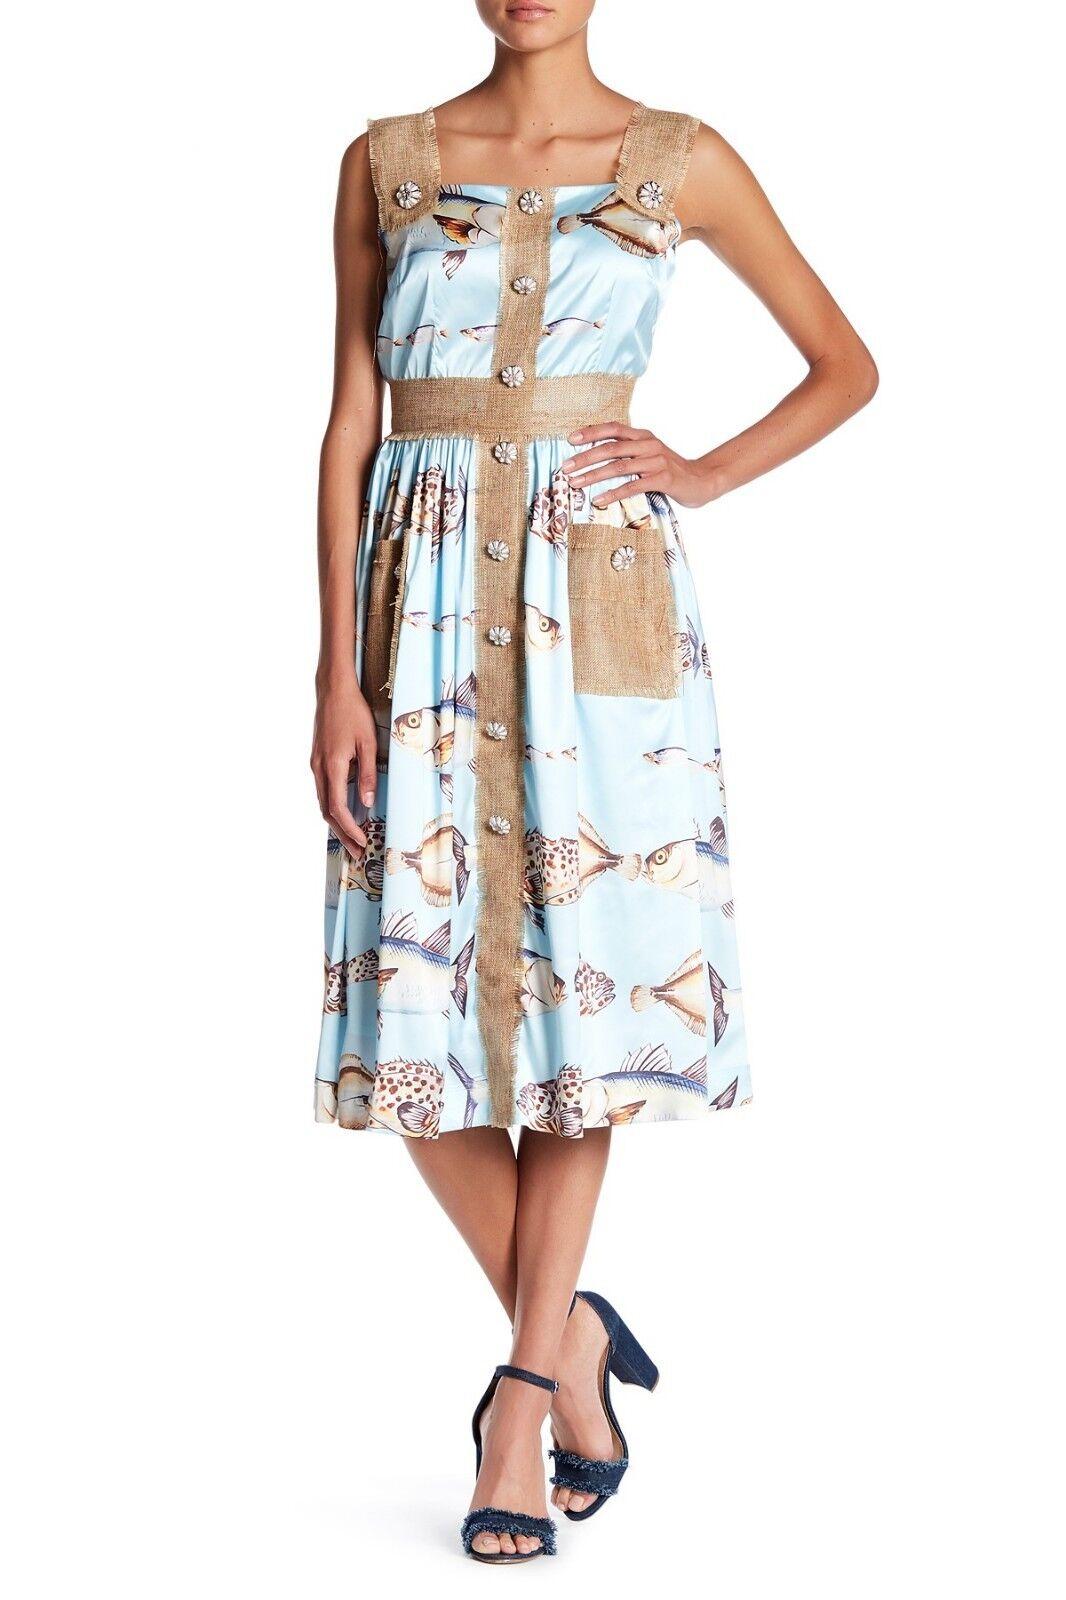 NWT TOV Burlap Contrast Button Printed Sleeveless Dress Fish Print bluee 40 US 6